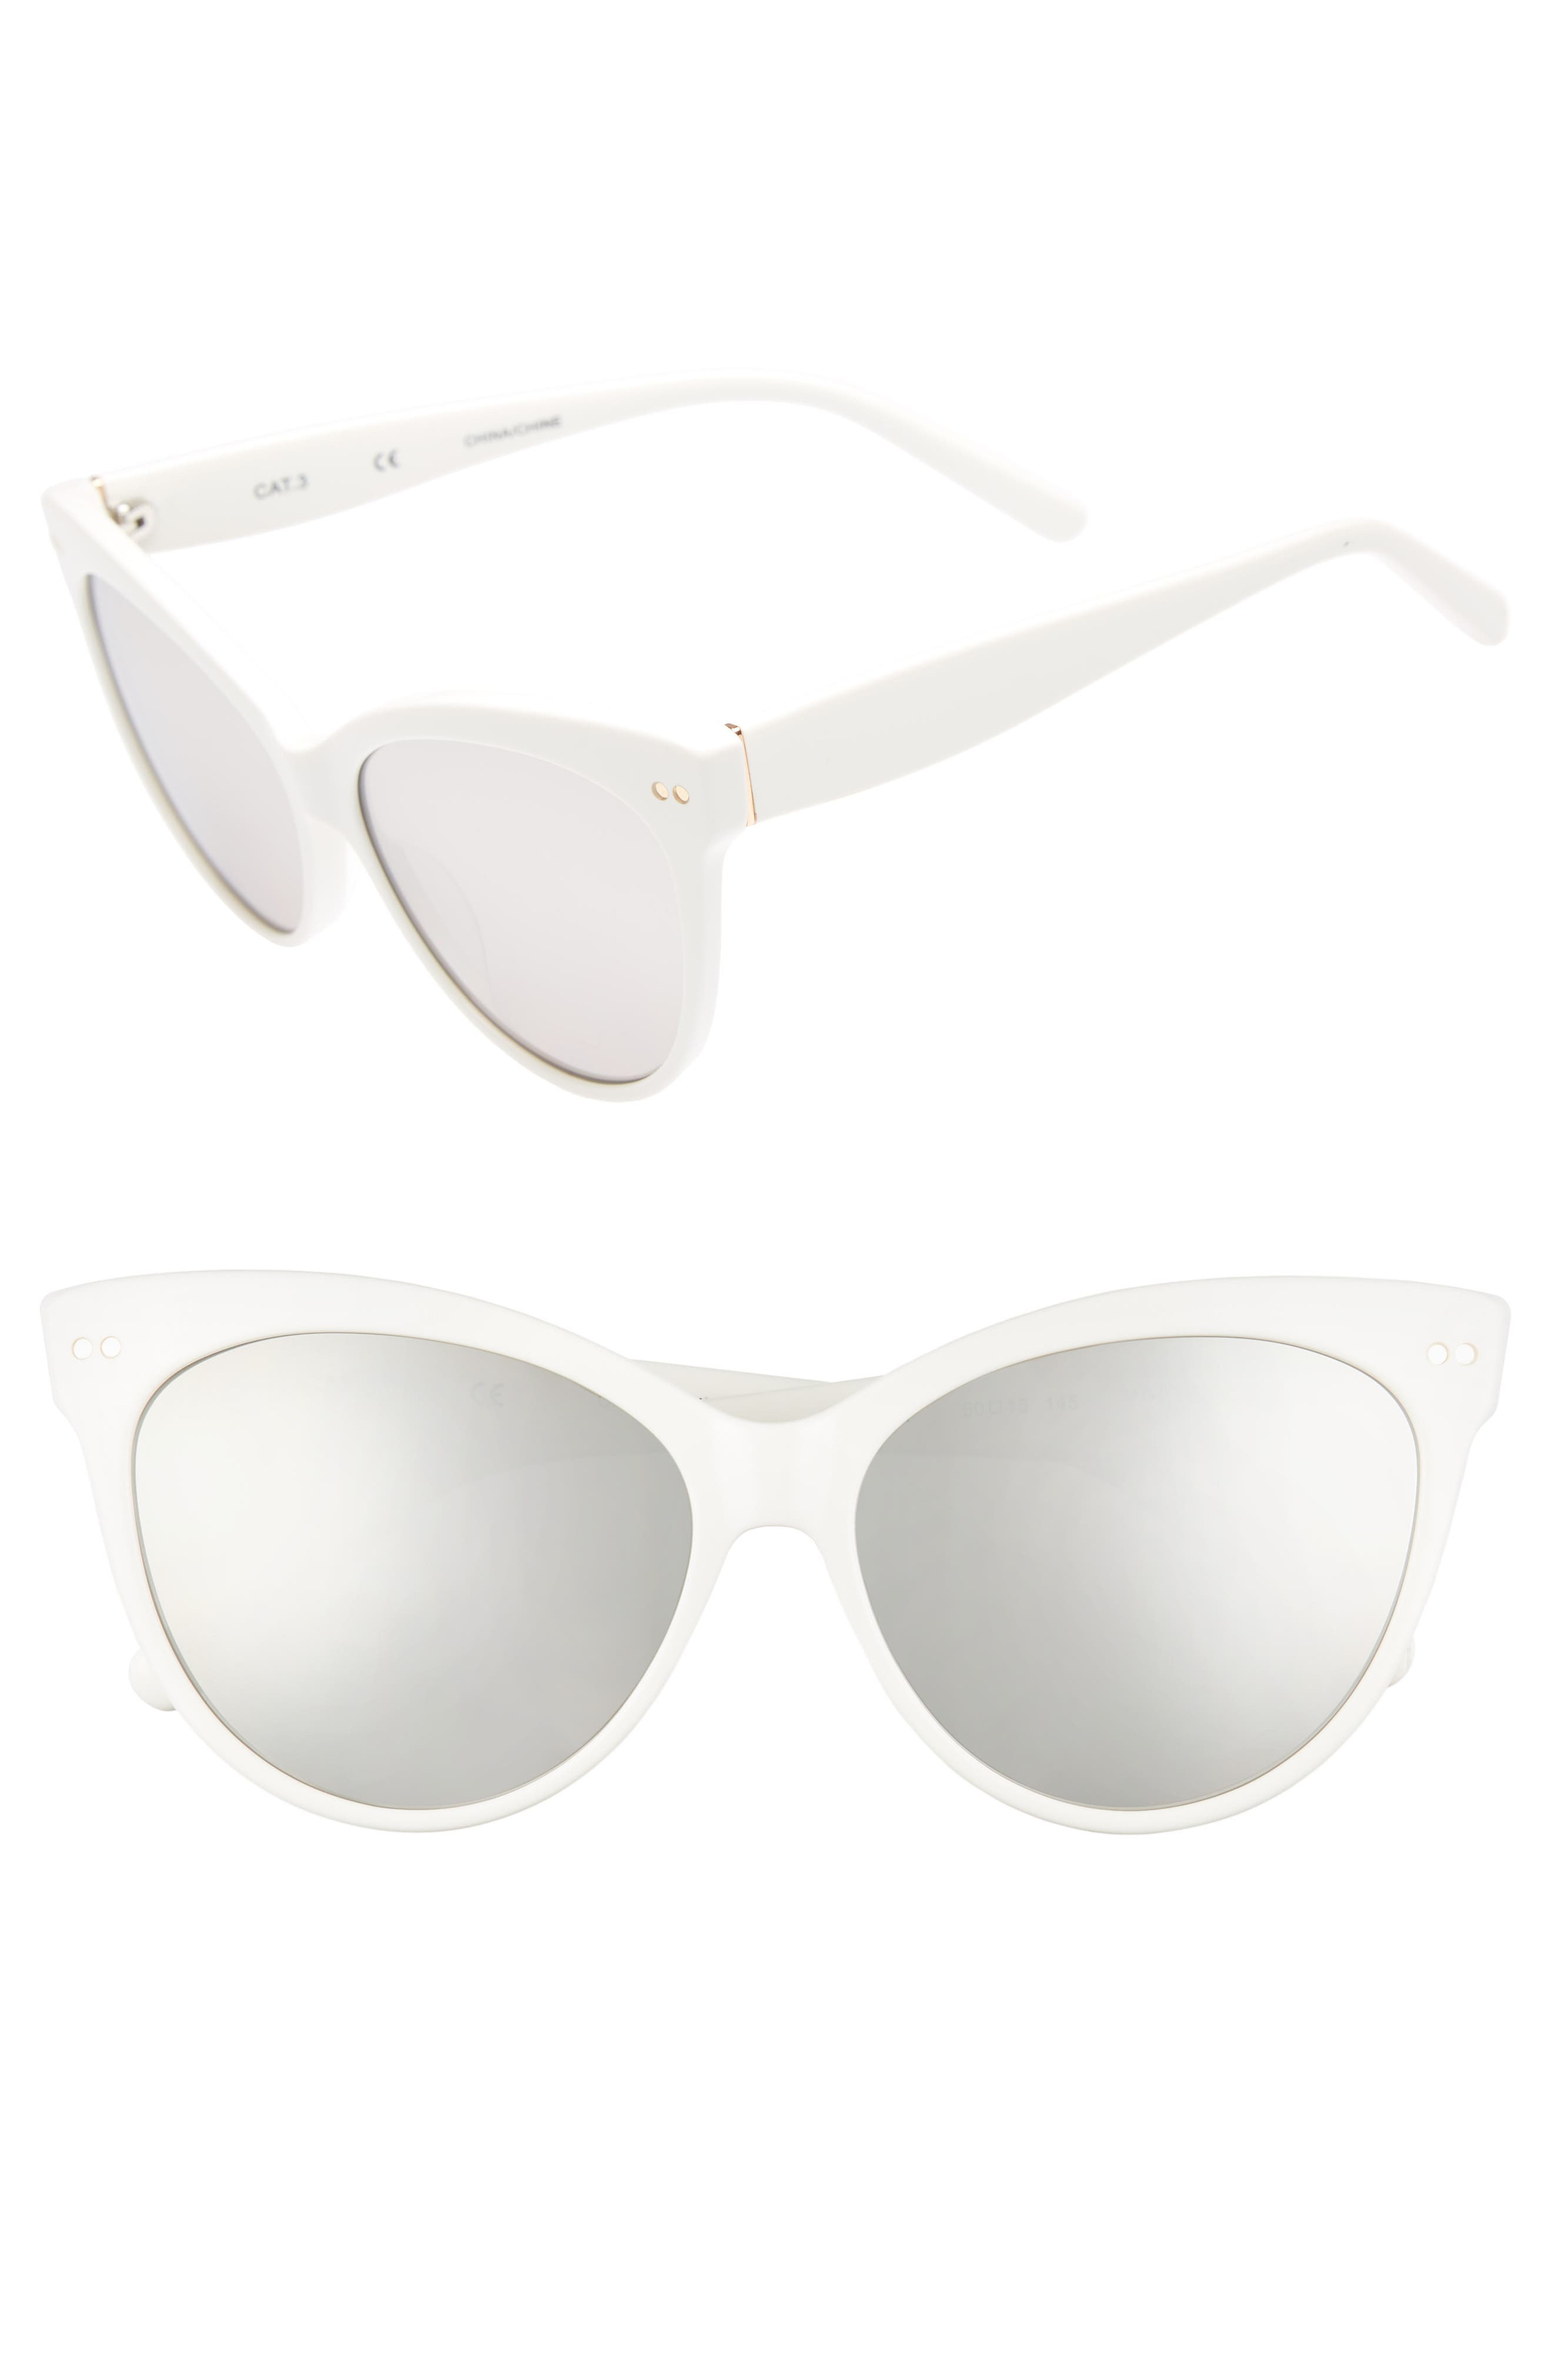 Audrey 60mm Cat Eye Sunglasses,                             Main thumbnail 1, color,                             WHITE